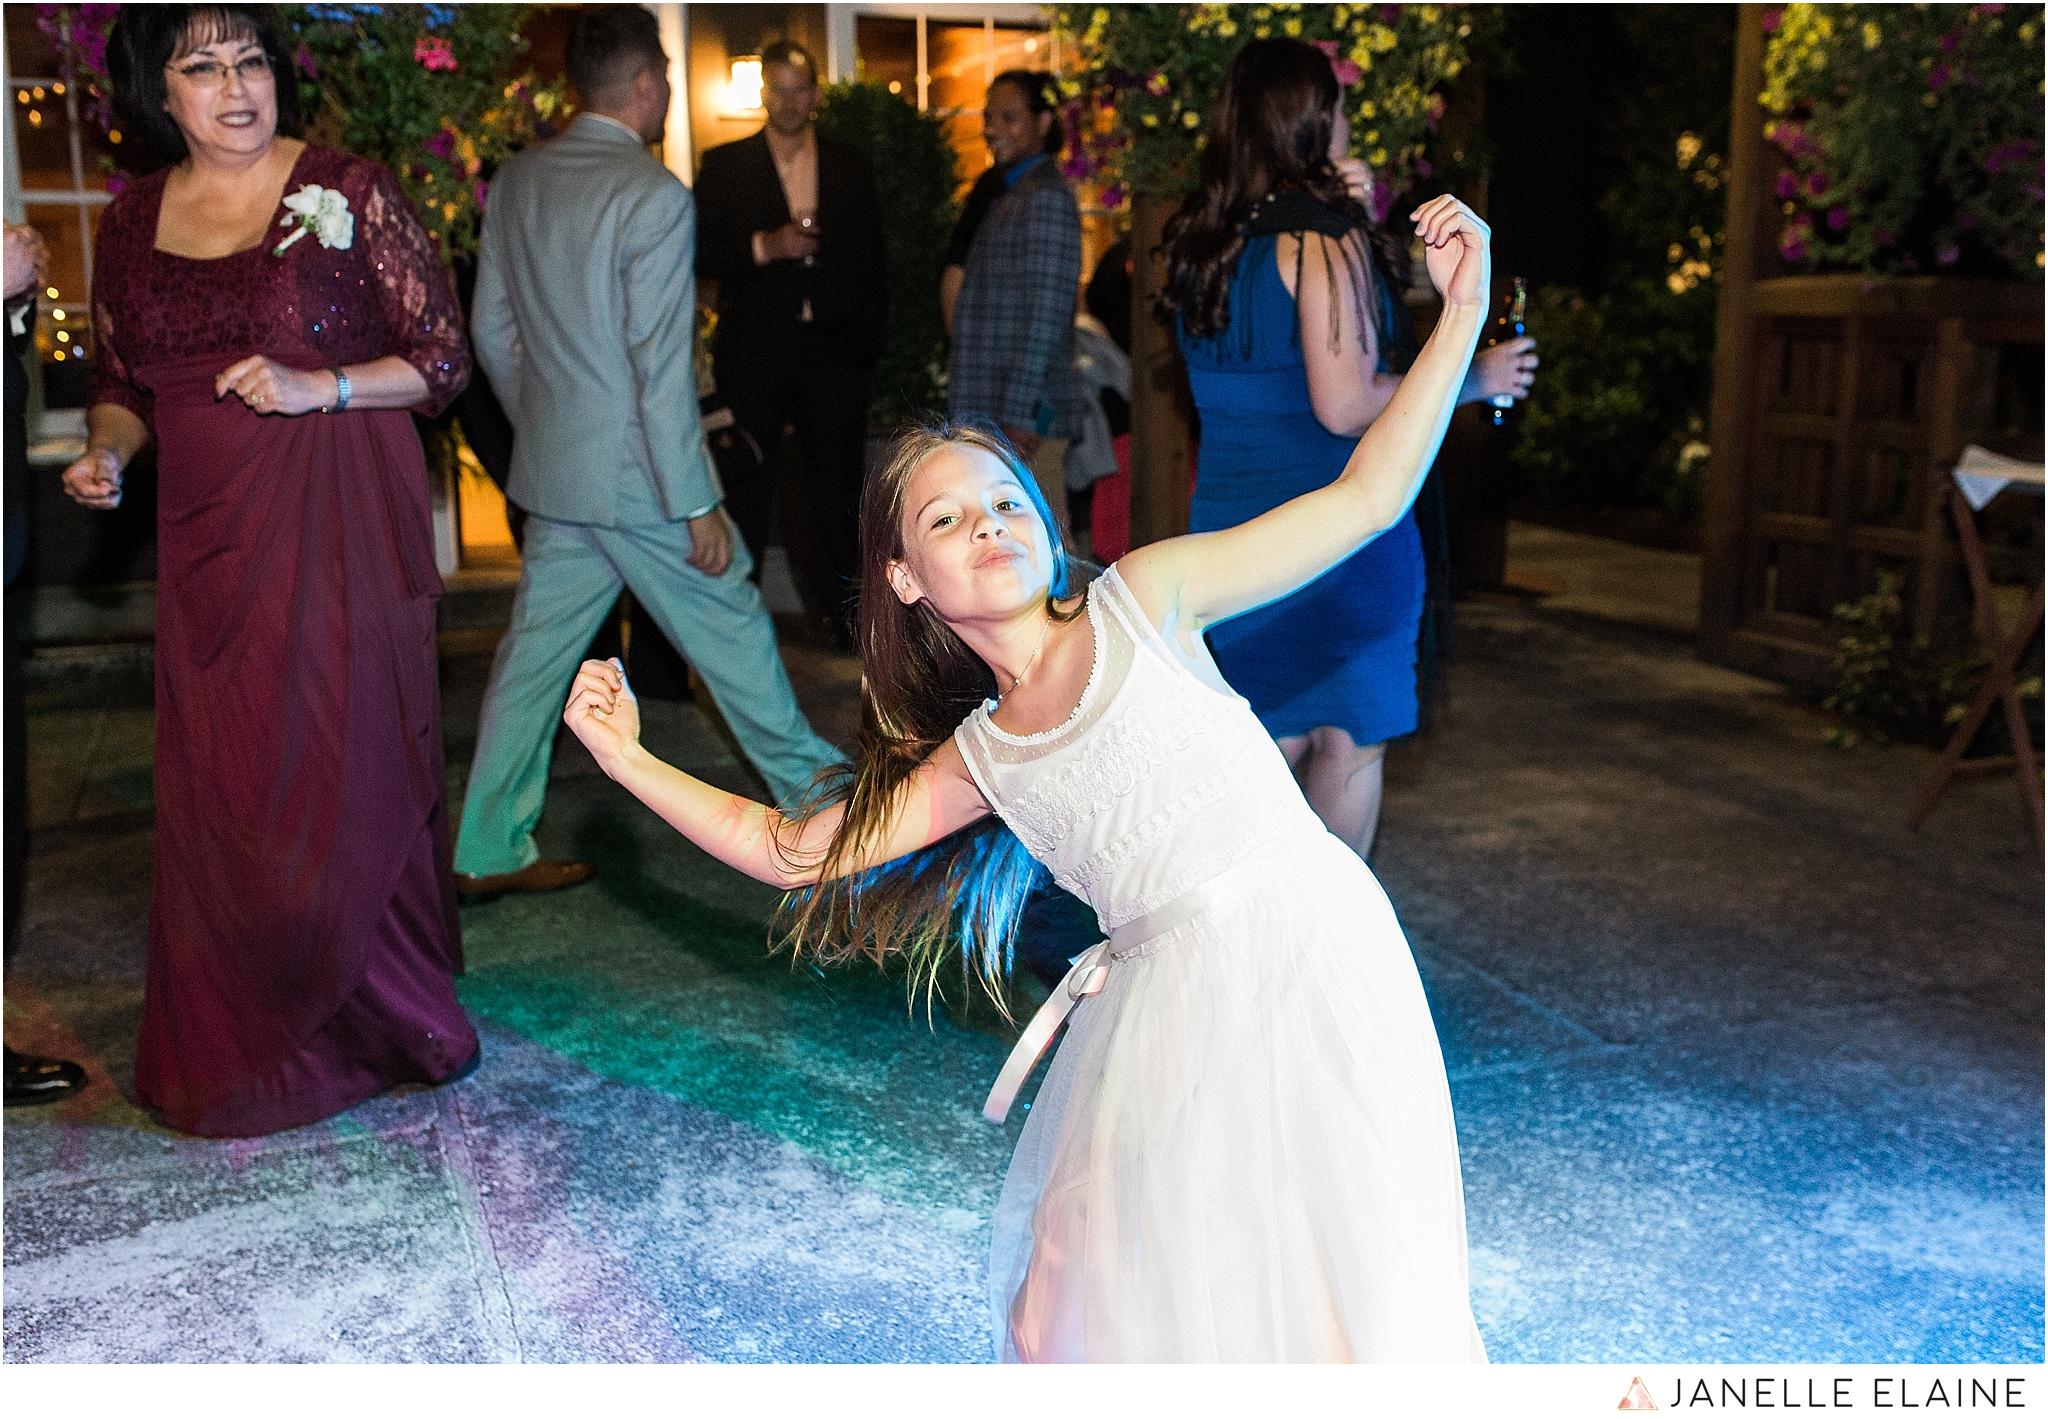 janelle elaine photography-professional wedding photographer-seattle-bellevue-robinswood house-284.jpg